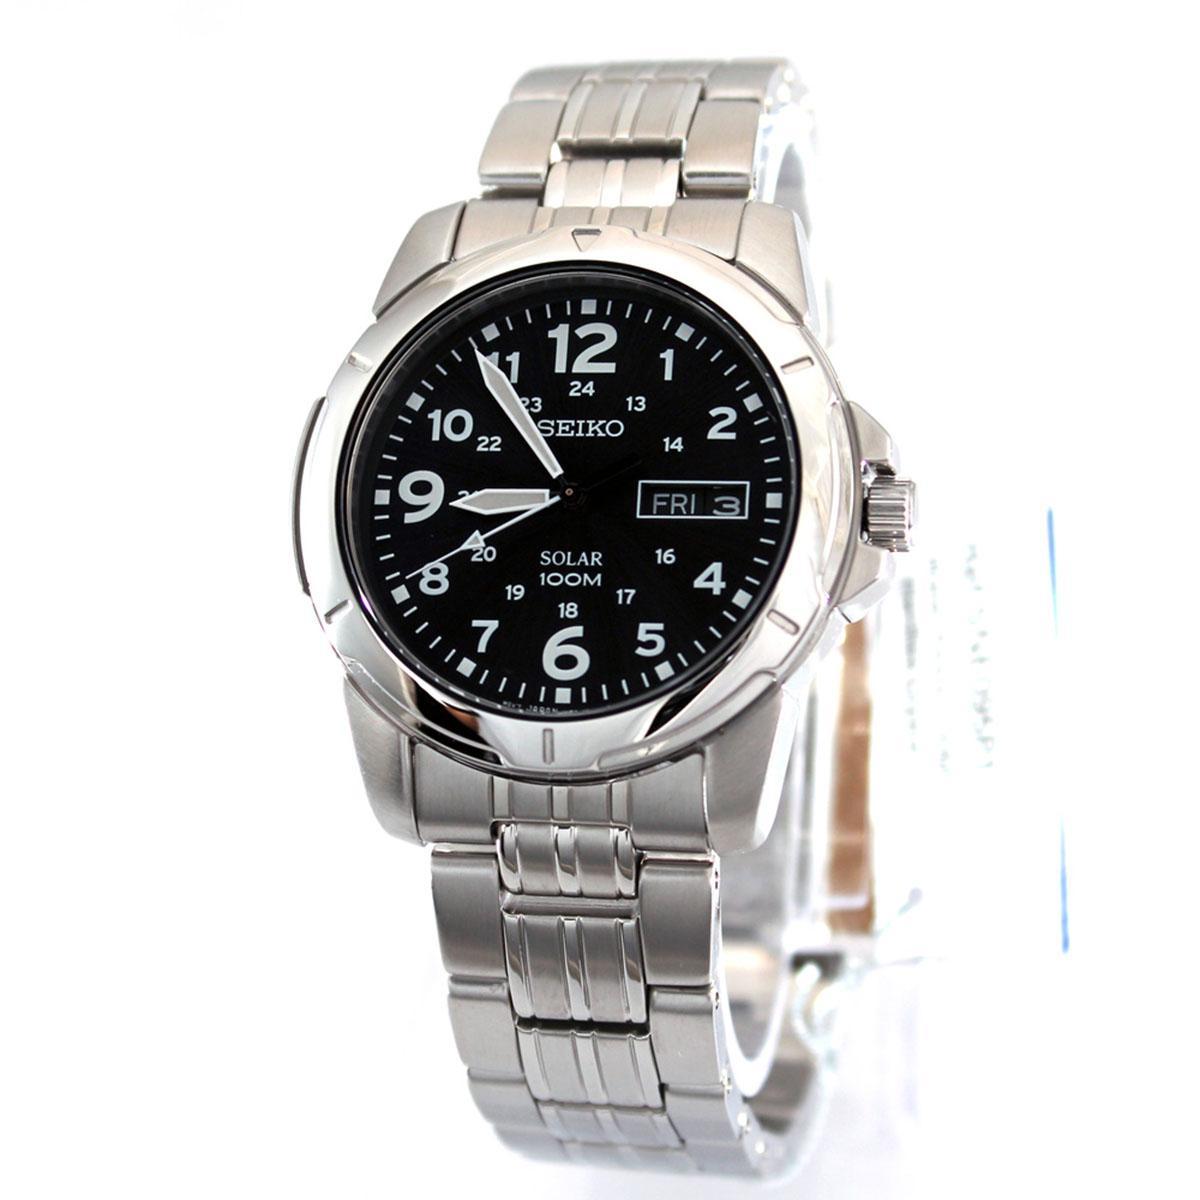 Seiko Seiko Solar Silver Stainless Steel Case Stainless Steel Bracelet Mens Sne095P1 Lowest Price